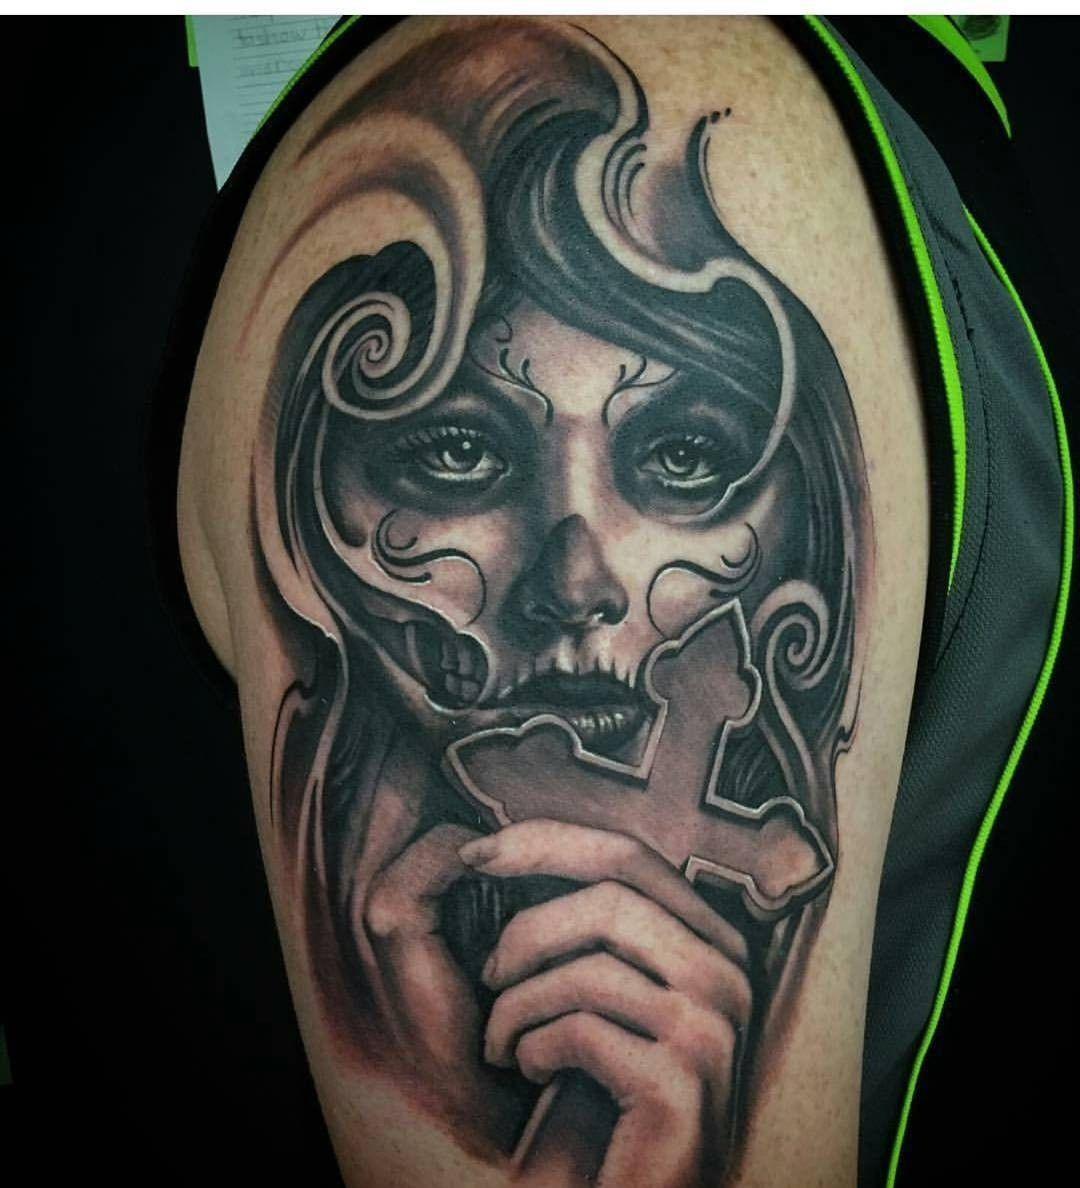 pin de gabito lucero en tattoo dise os pinterest tatuajes dia de los muertos y disenos de unas. Black Bedroom Furniture Sets. Home Design Ideas